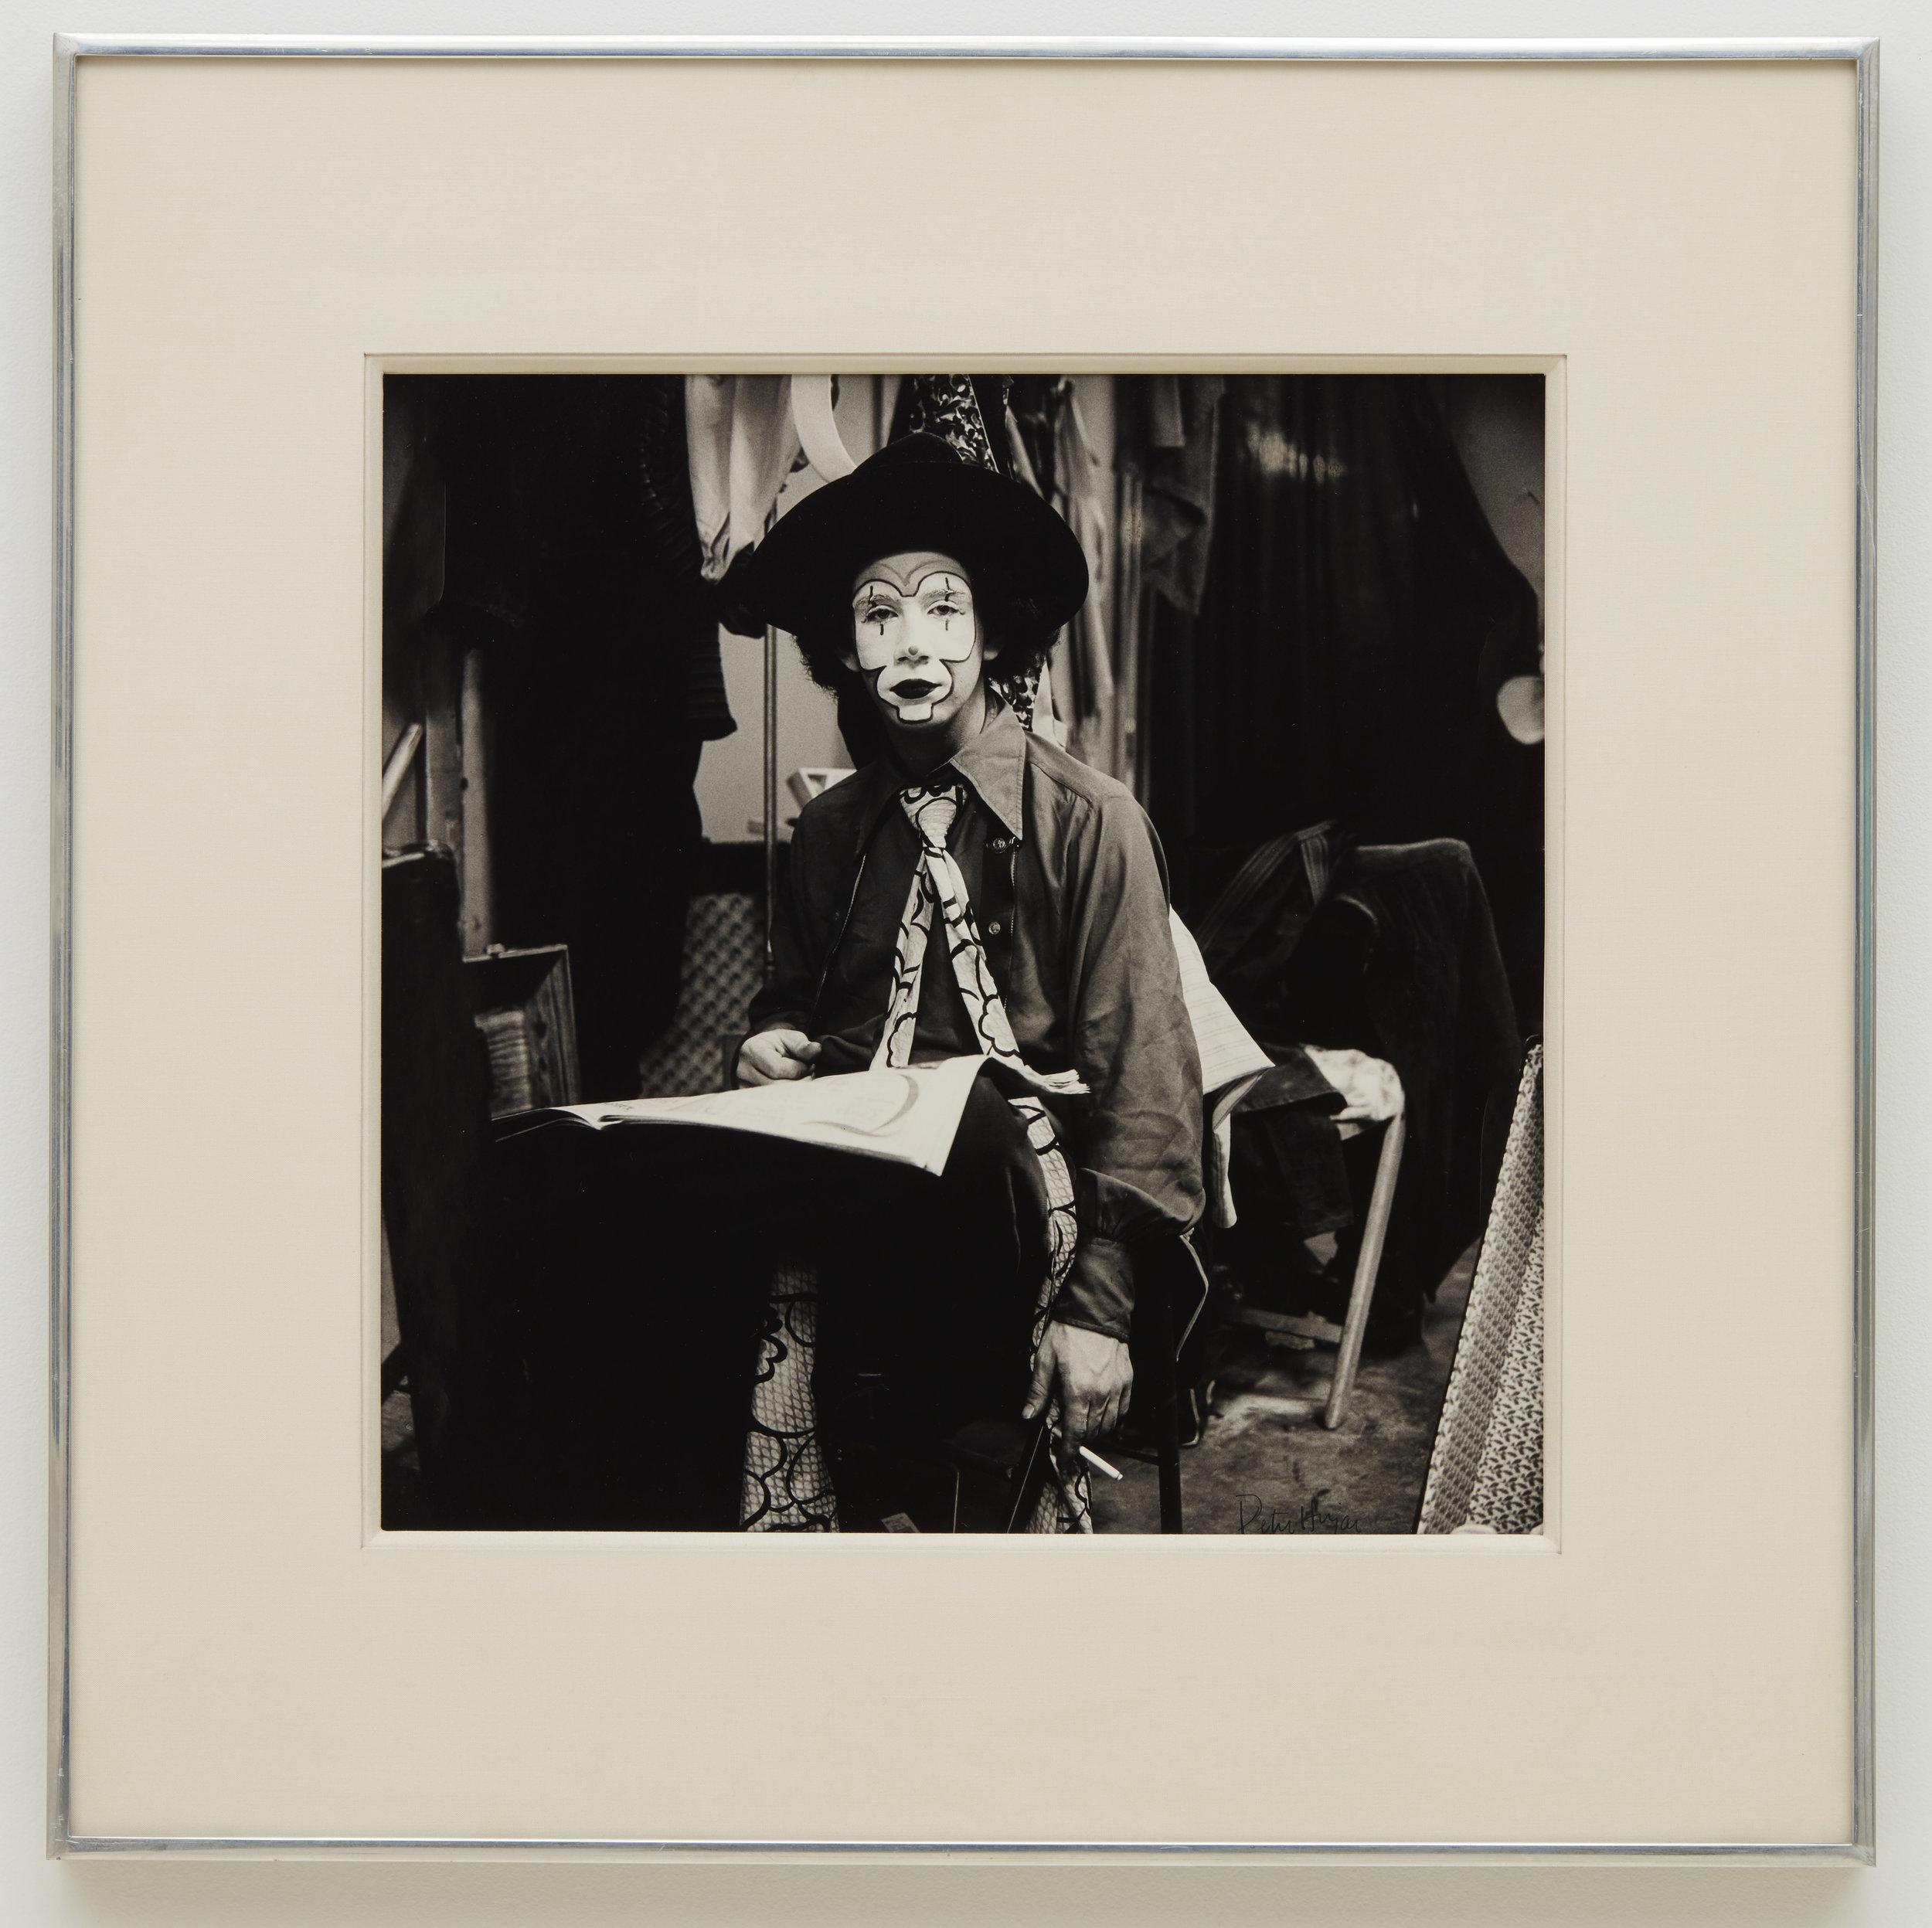 Peter HUJAR  Clown with Long Tie (II) , 1972 Gelatin silver print 14 5/8 x 14 5/8 inches